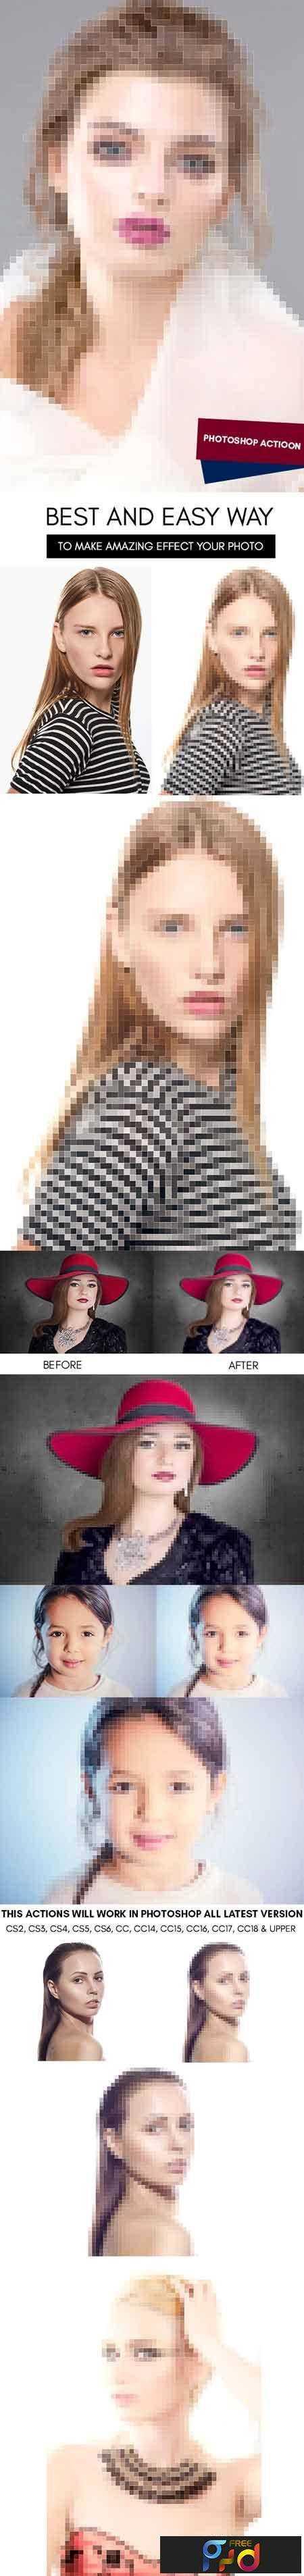 1805074 Pixel Art Photoshop Action 21649352 1